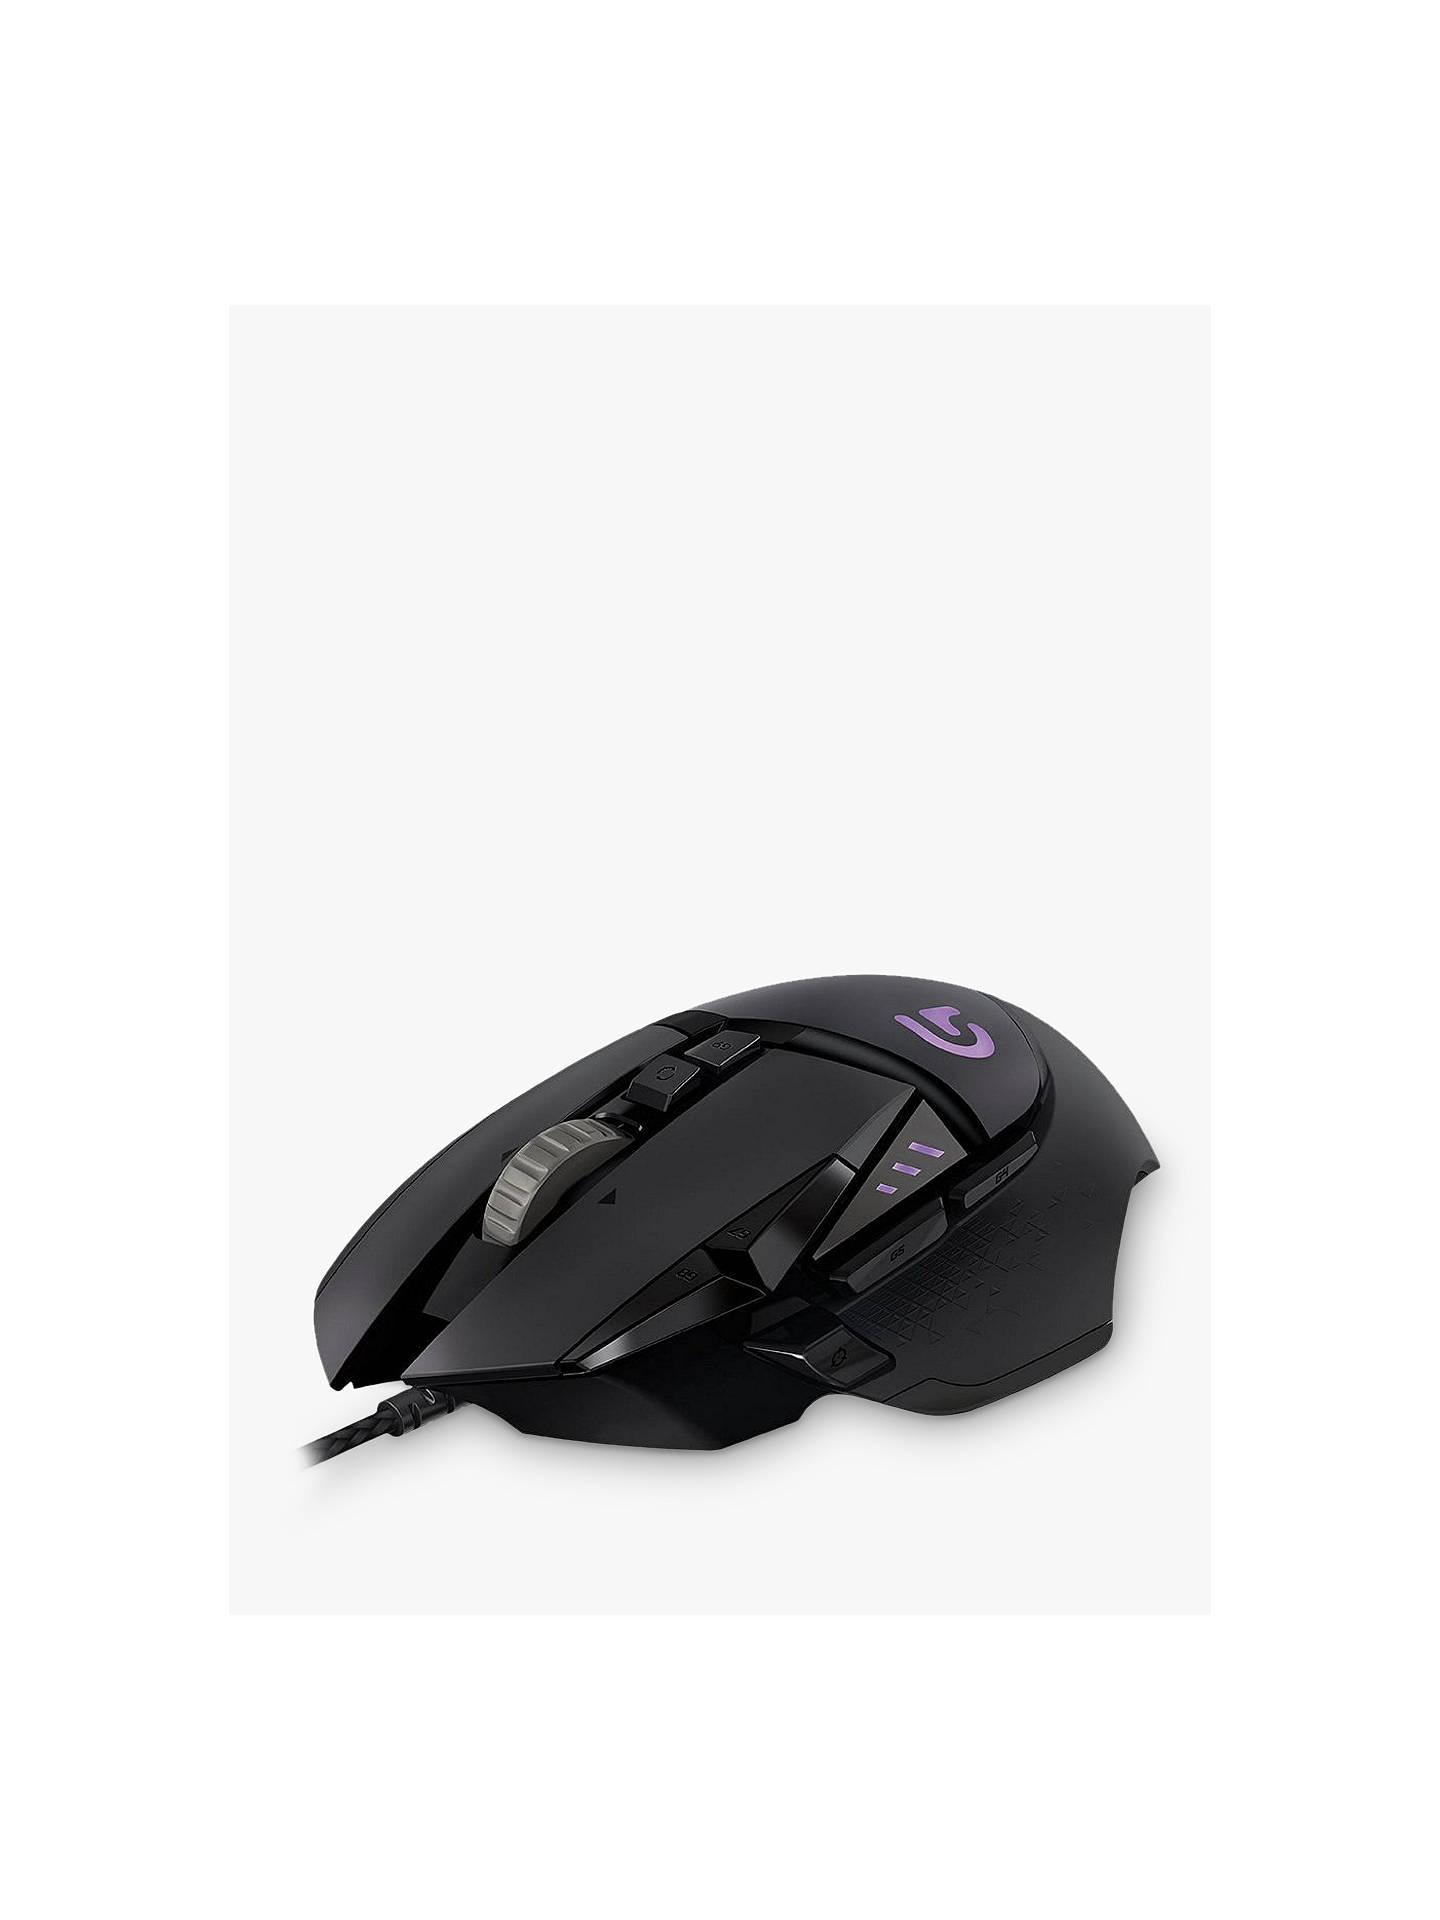 e07e5530b39 Buy Logitech G502 Proteus Spectrum RGB Tunable Gaming Mouse, Black Online  at johnlewis.com ...